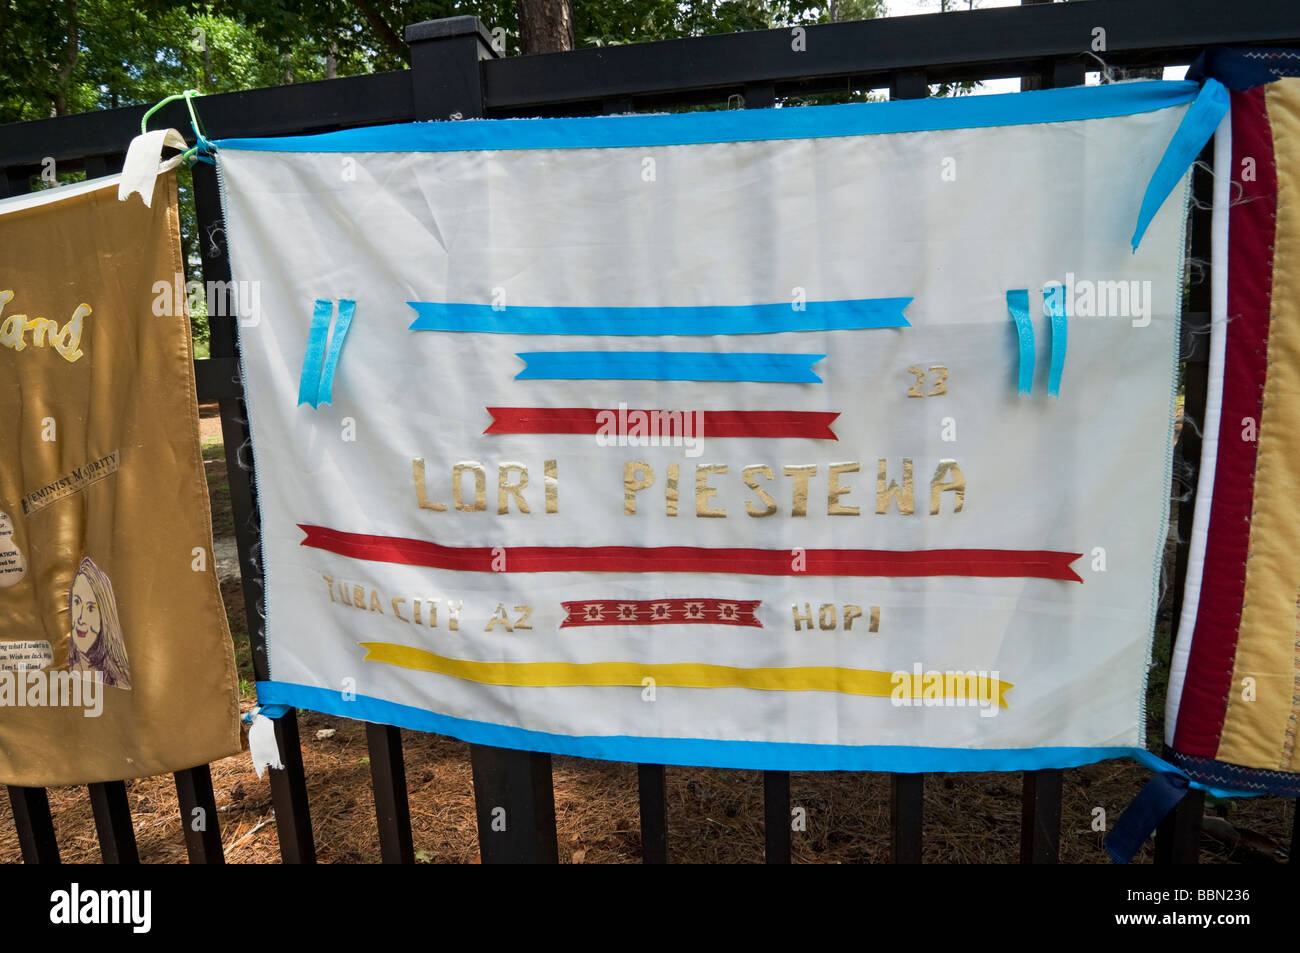 Memmorial Banners League Legends Banners